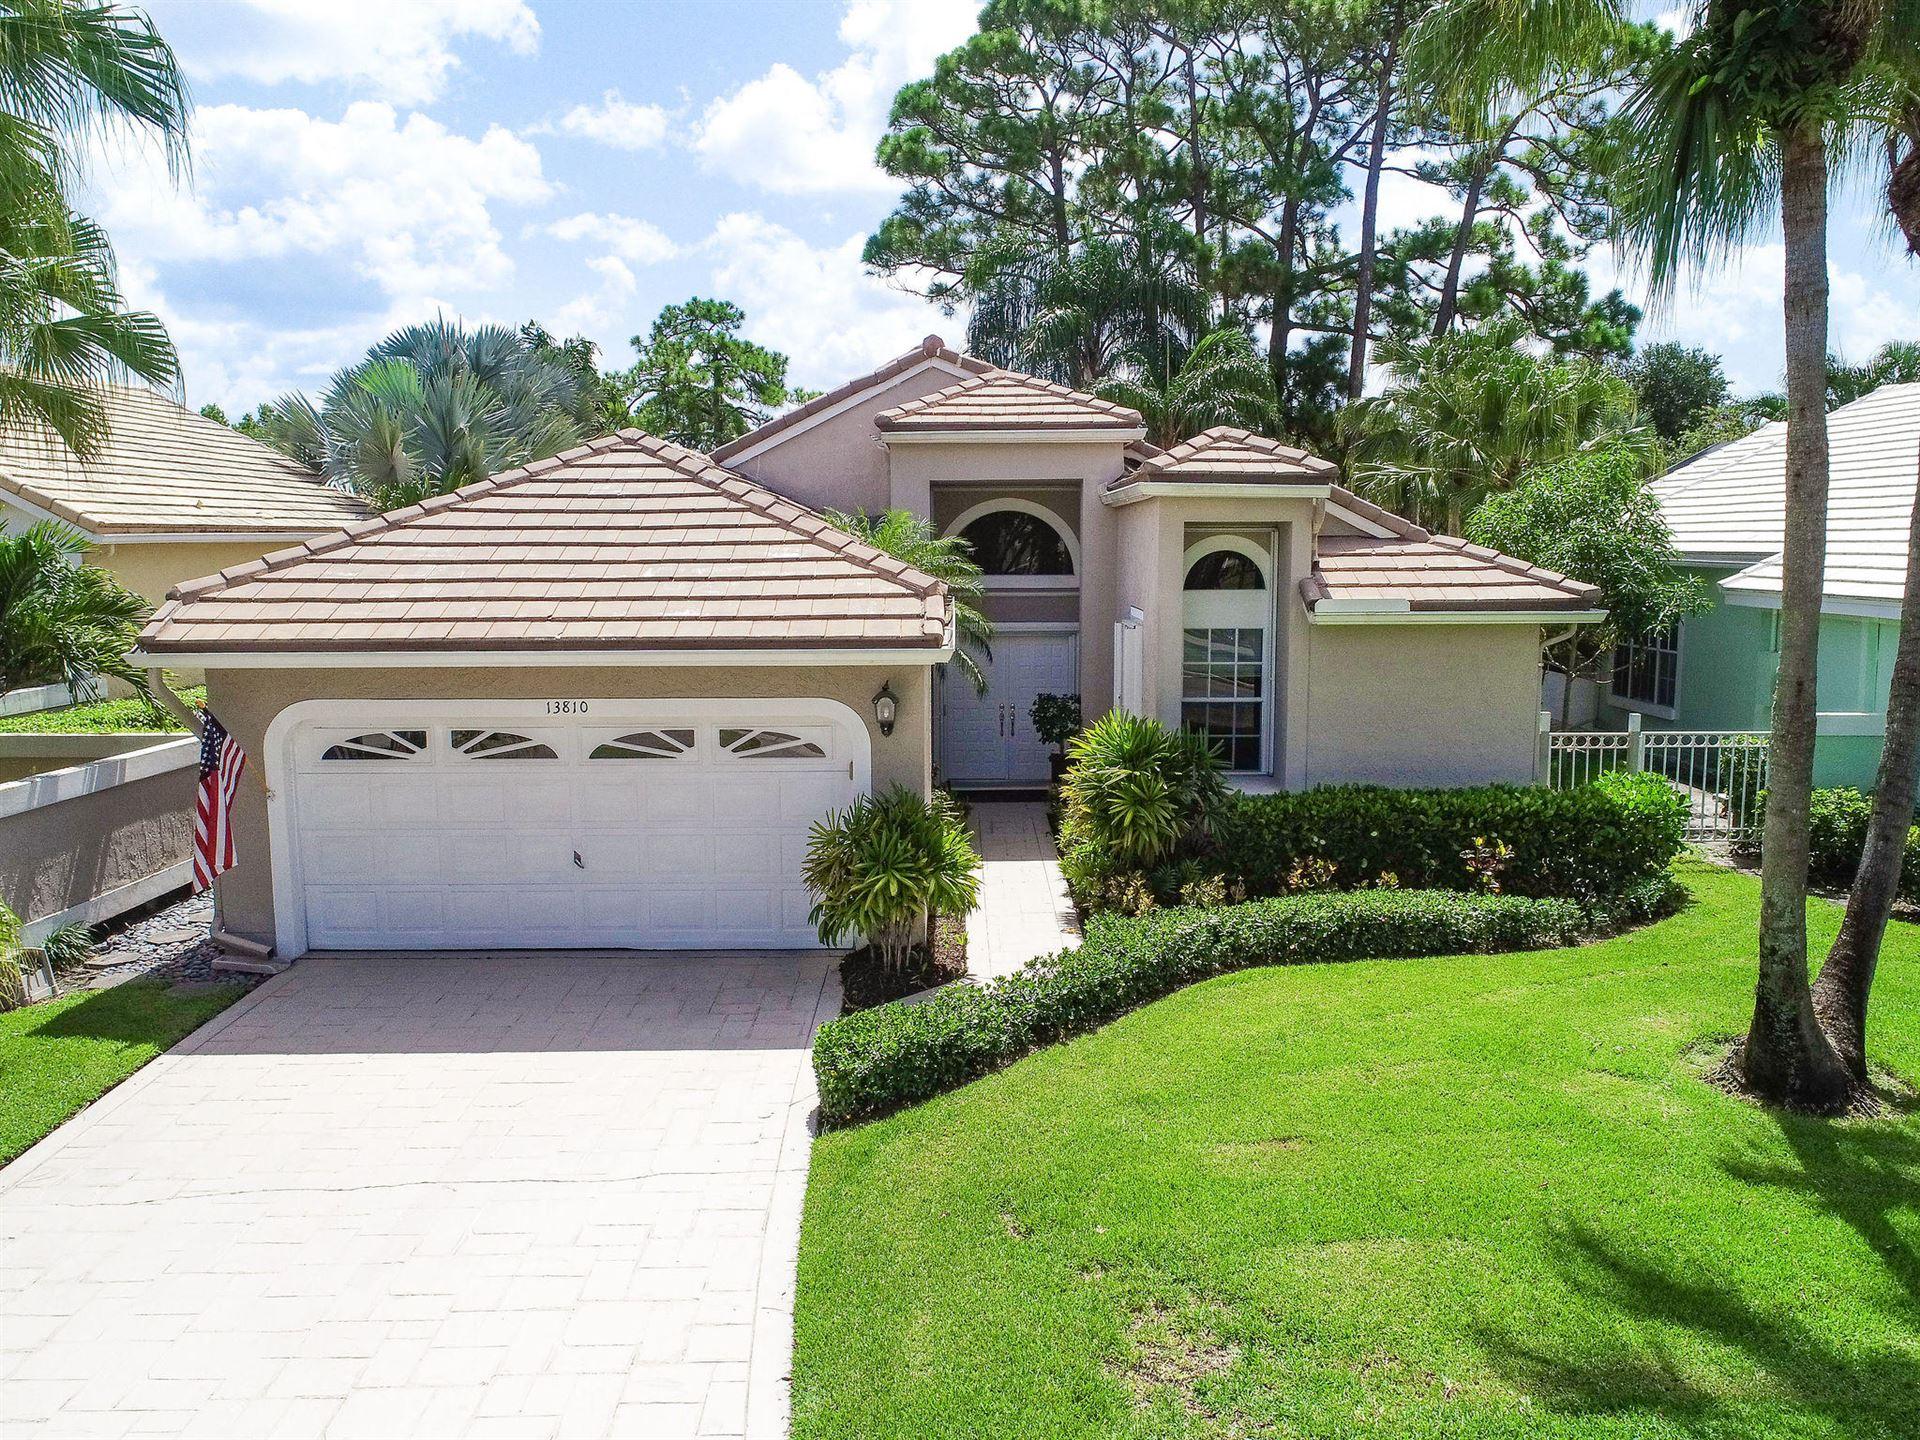 13810 Crosspointe Court, Palm Beach Gardens, FL 33418 - #: RX-10636297